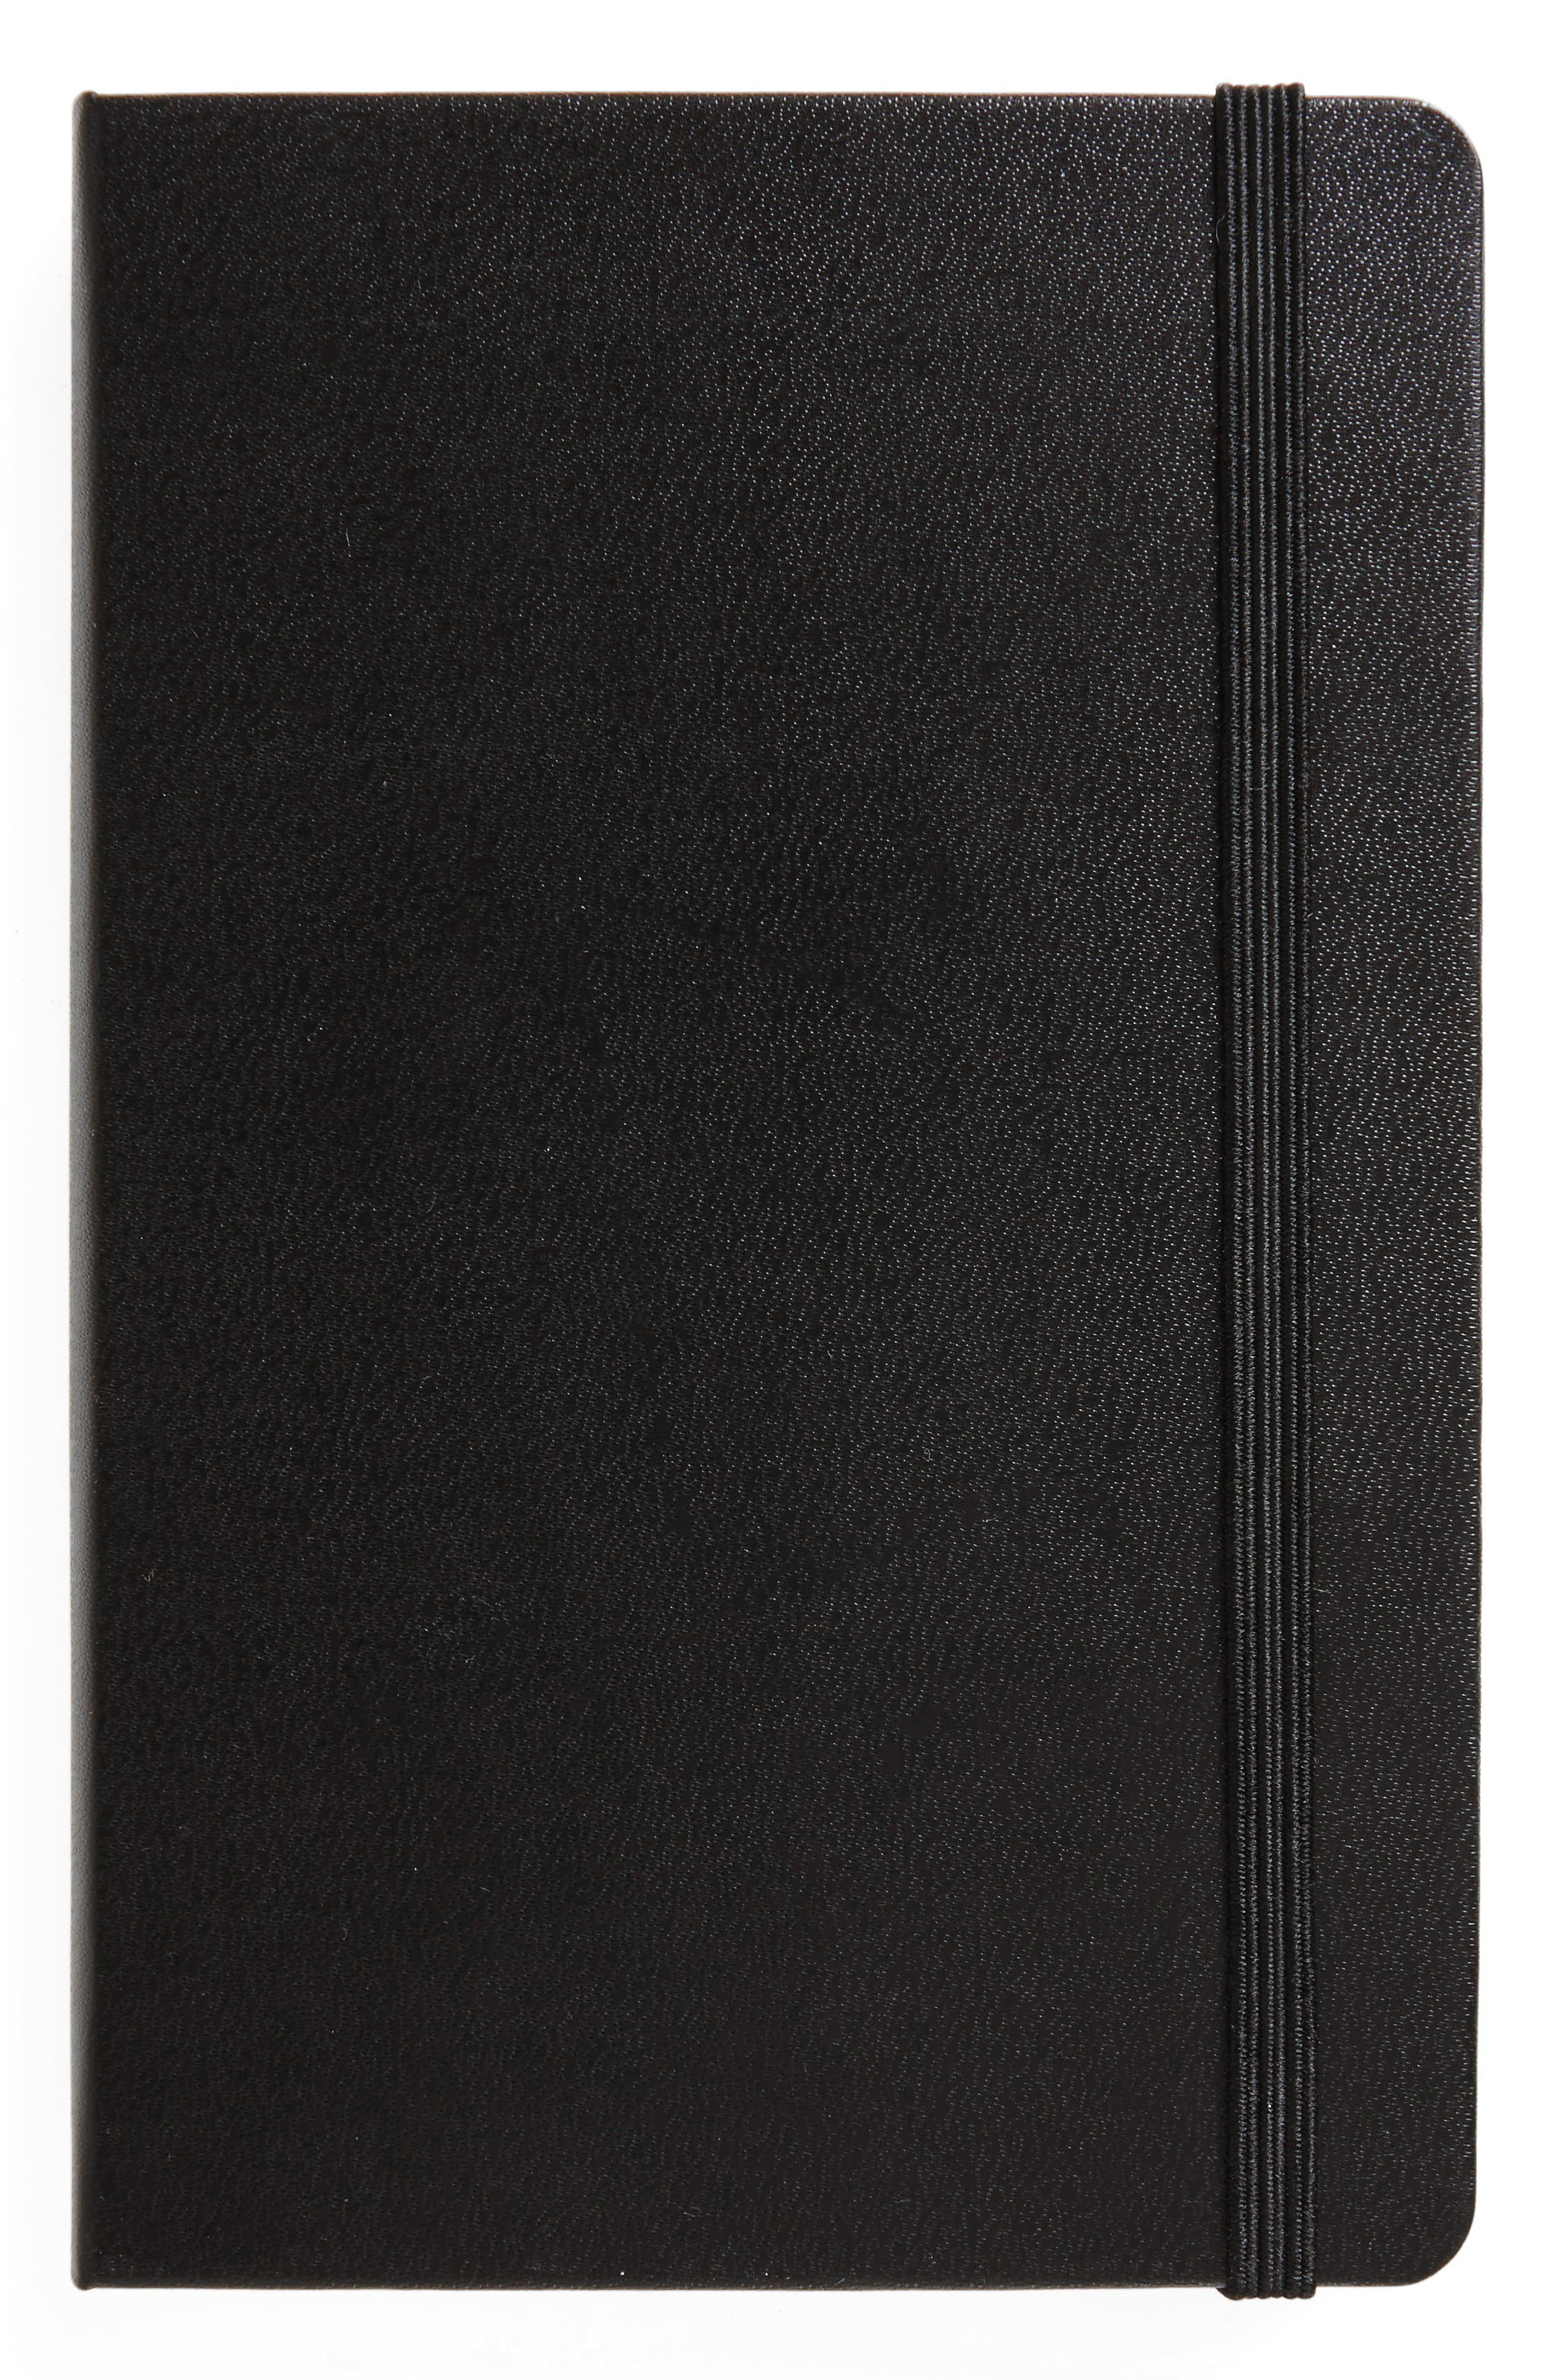 Alternate Image 1 Selected - Moleskine Classic Ruled Pocket Hardcover Notebook